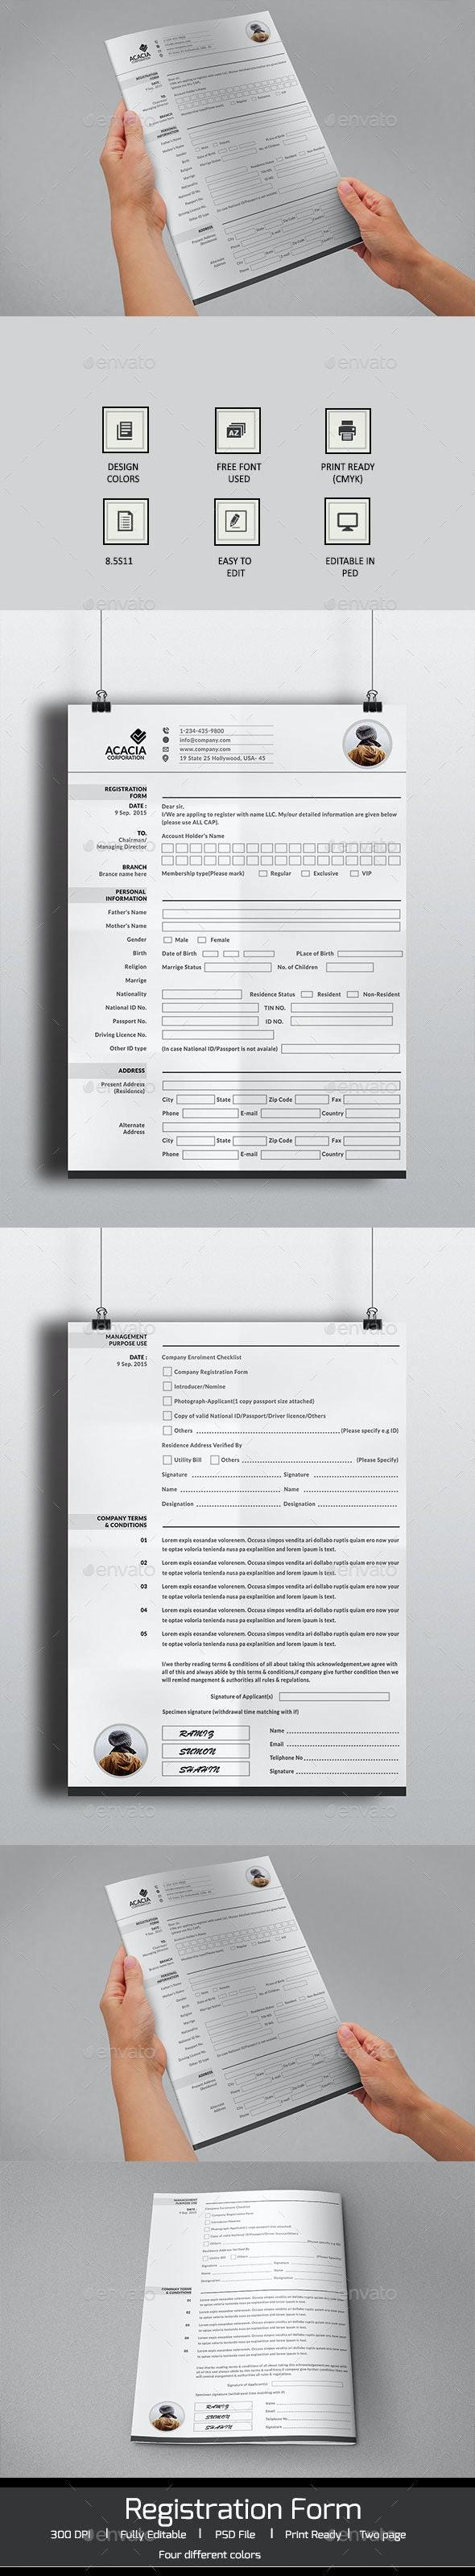 2 Page Registration Form - Miscellaneous Print Templates